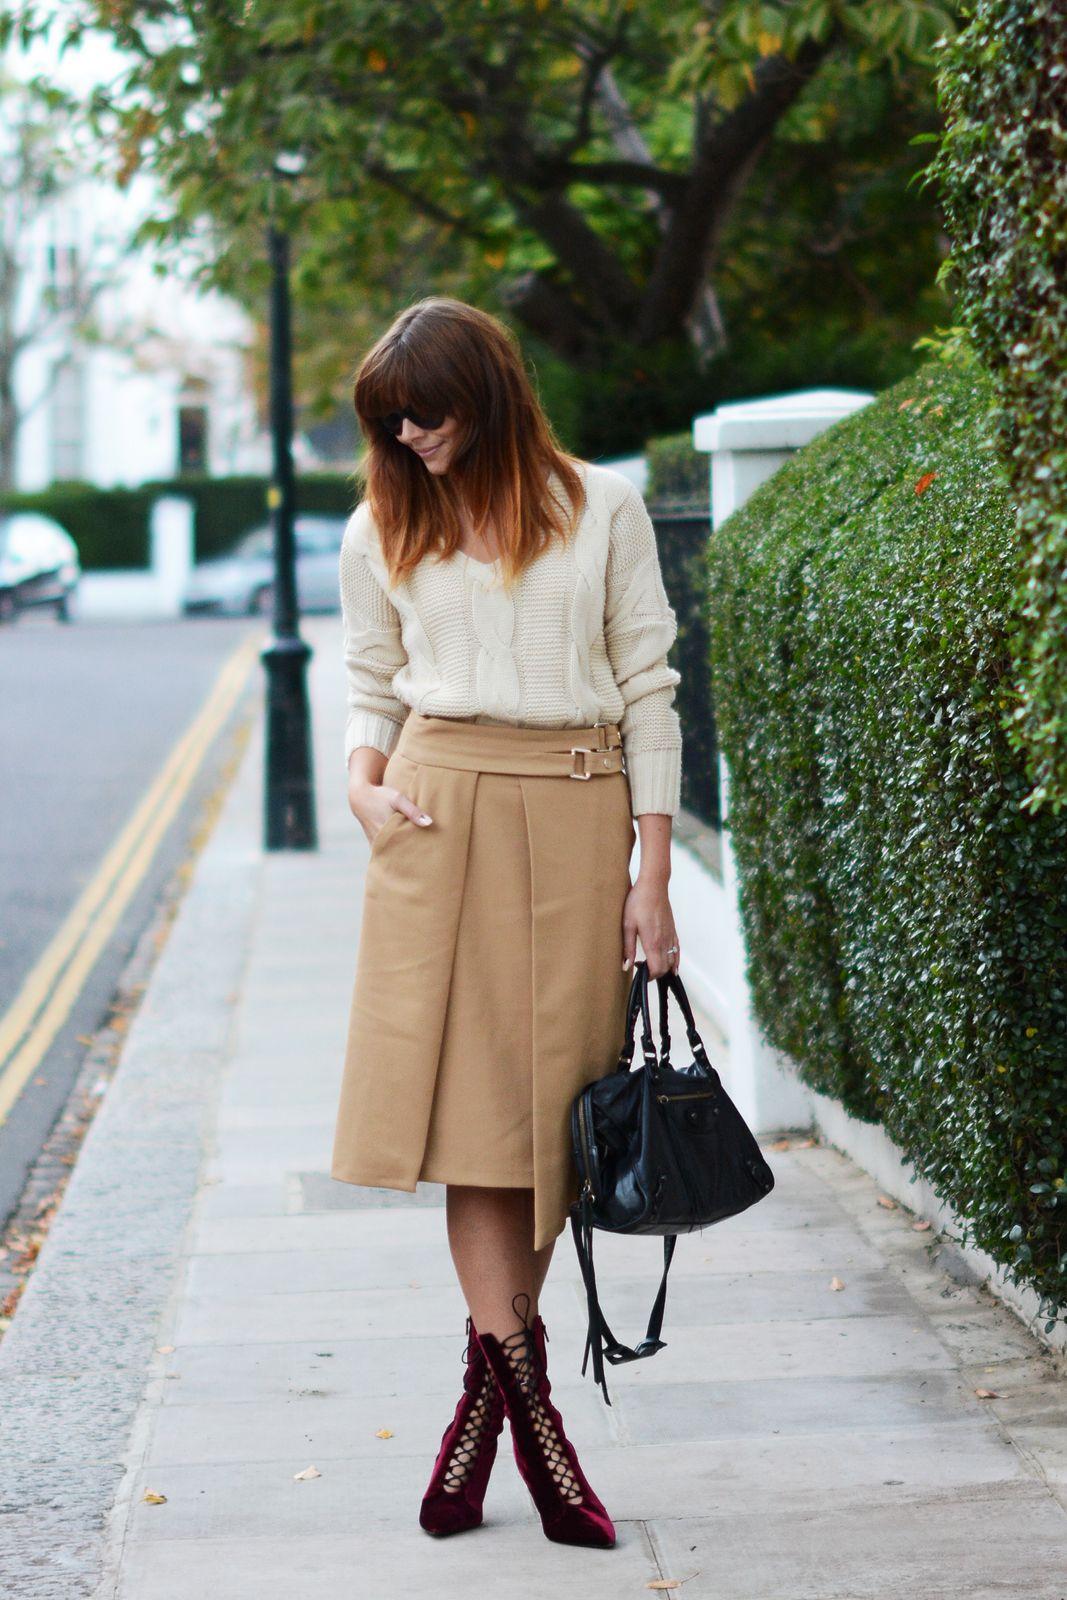 Emma Hill October 29, 2014 | EJSTYLE - OOTD Zara Camel wrap skirt ...